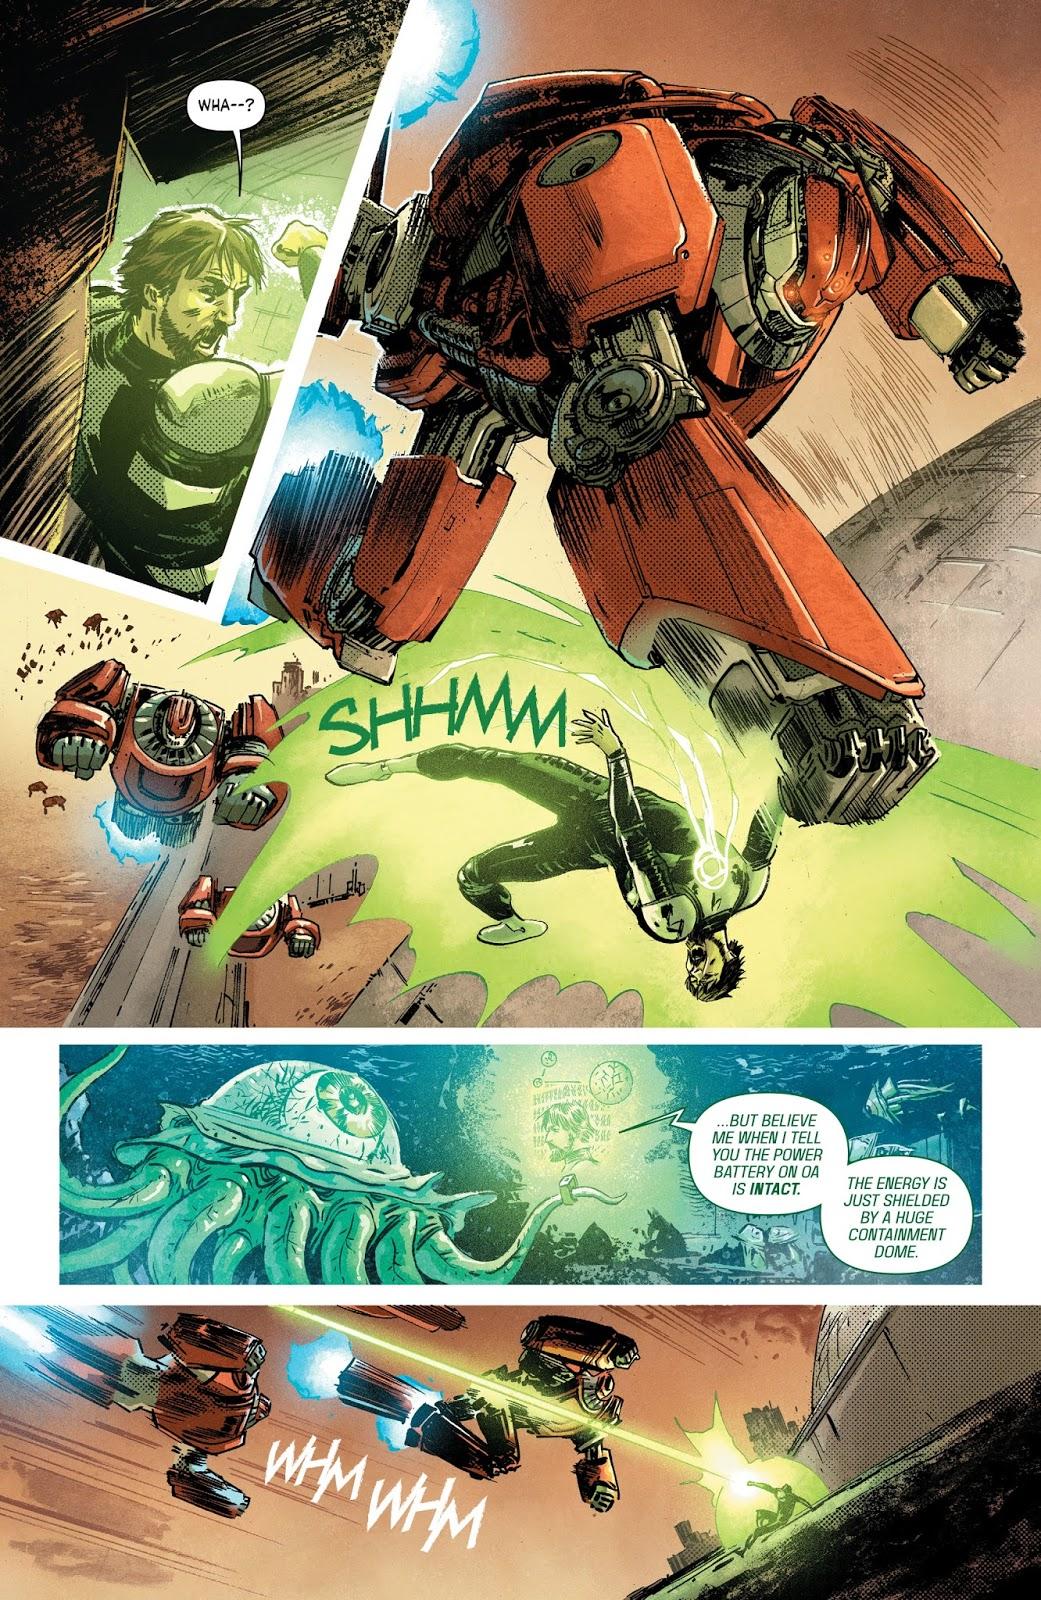 Hal-Jordon-Reforms-The-Green-Lantern-Corps-Earth-1